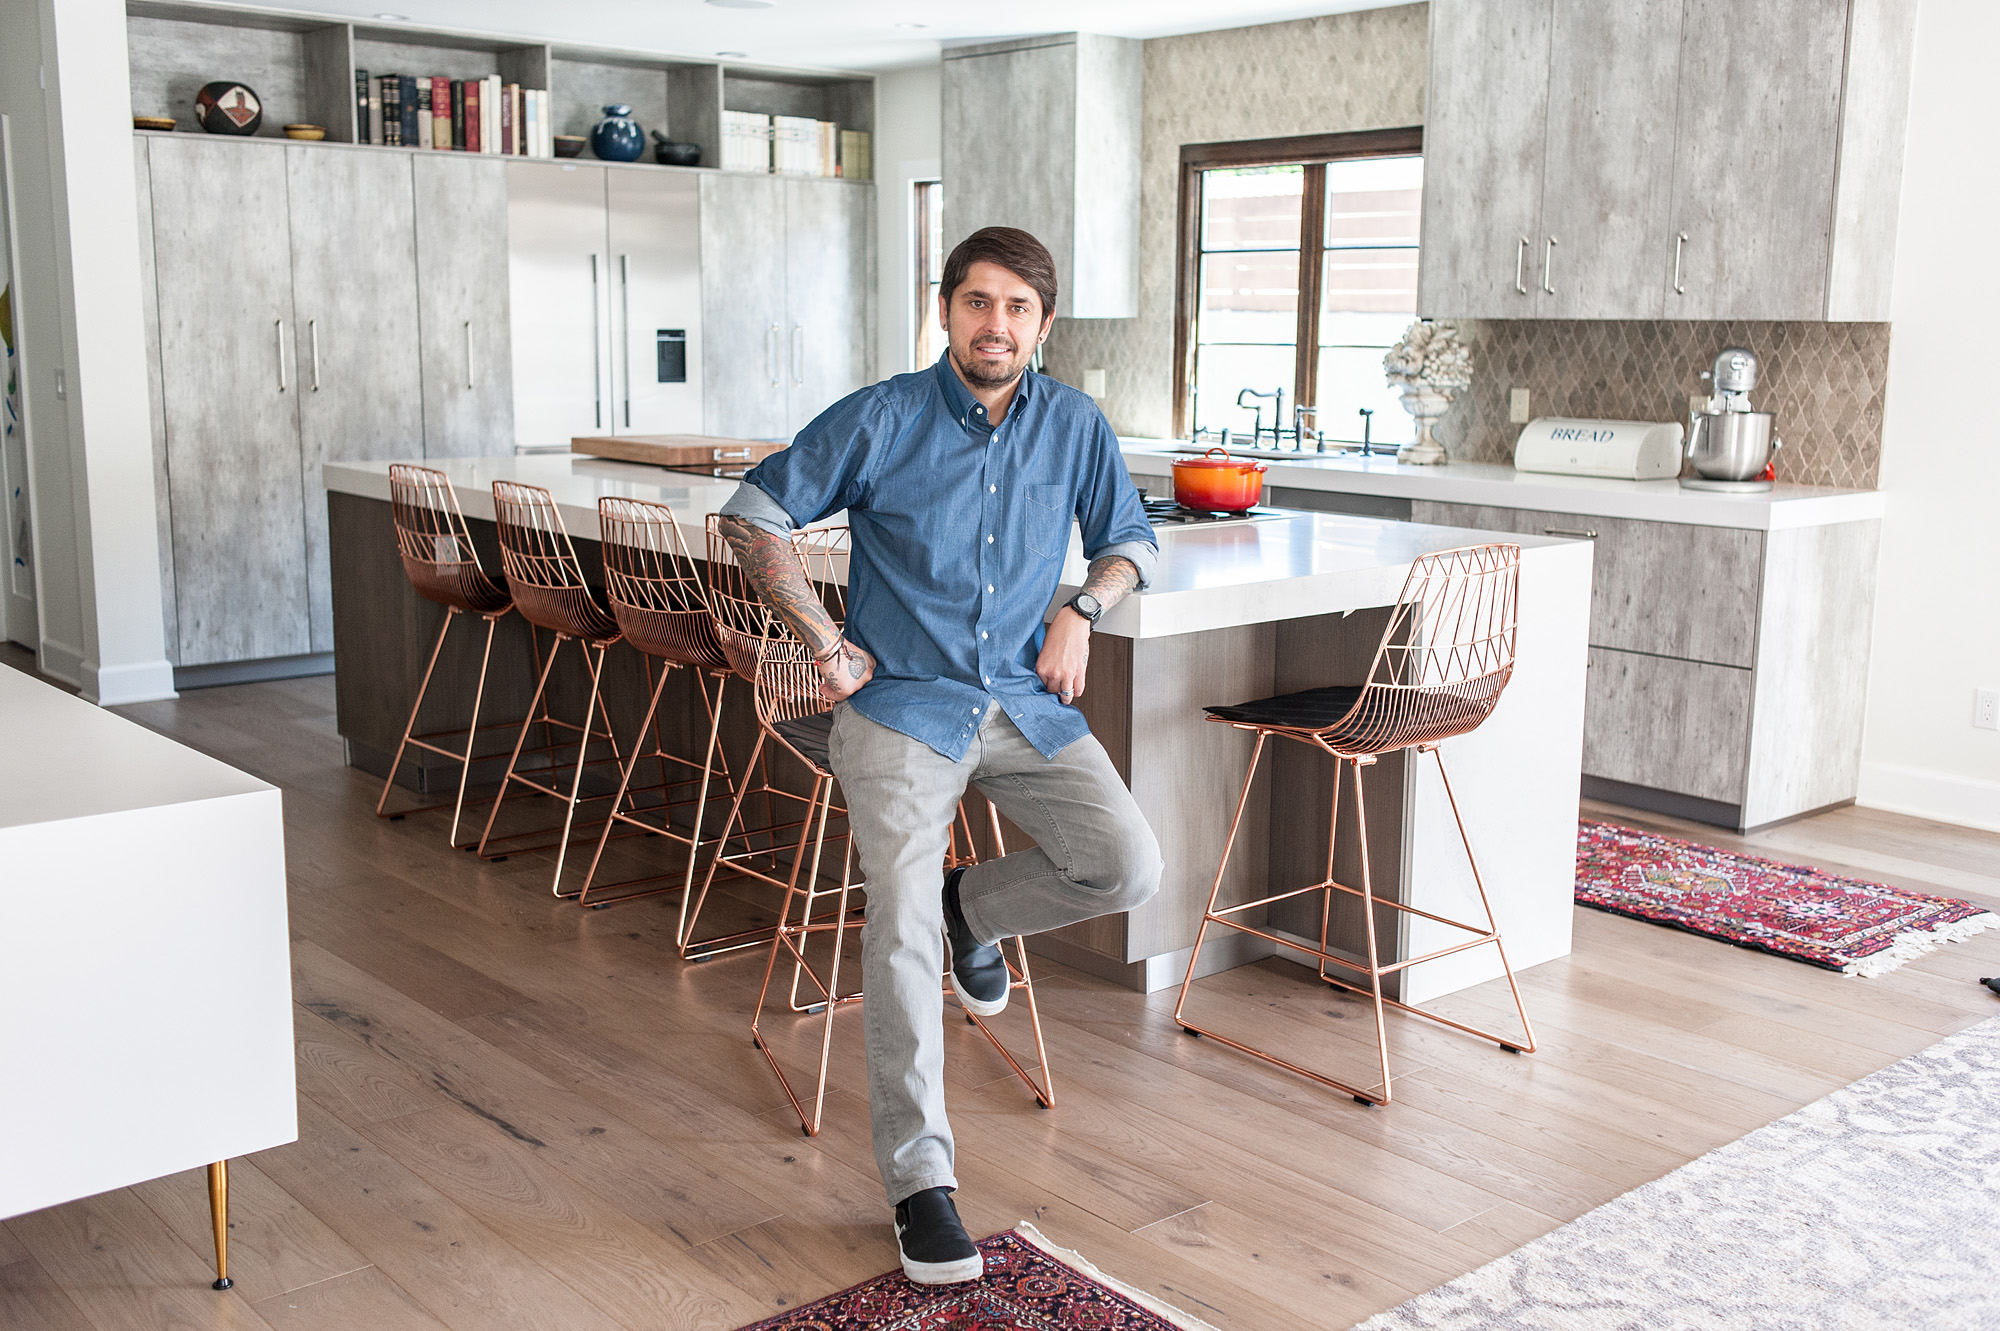 Ludo Lefebvre in his home kitchen